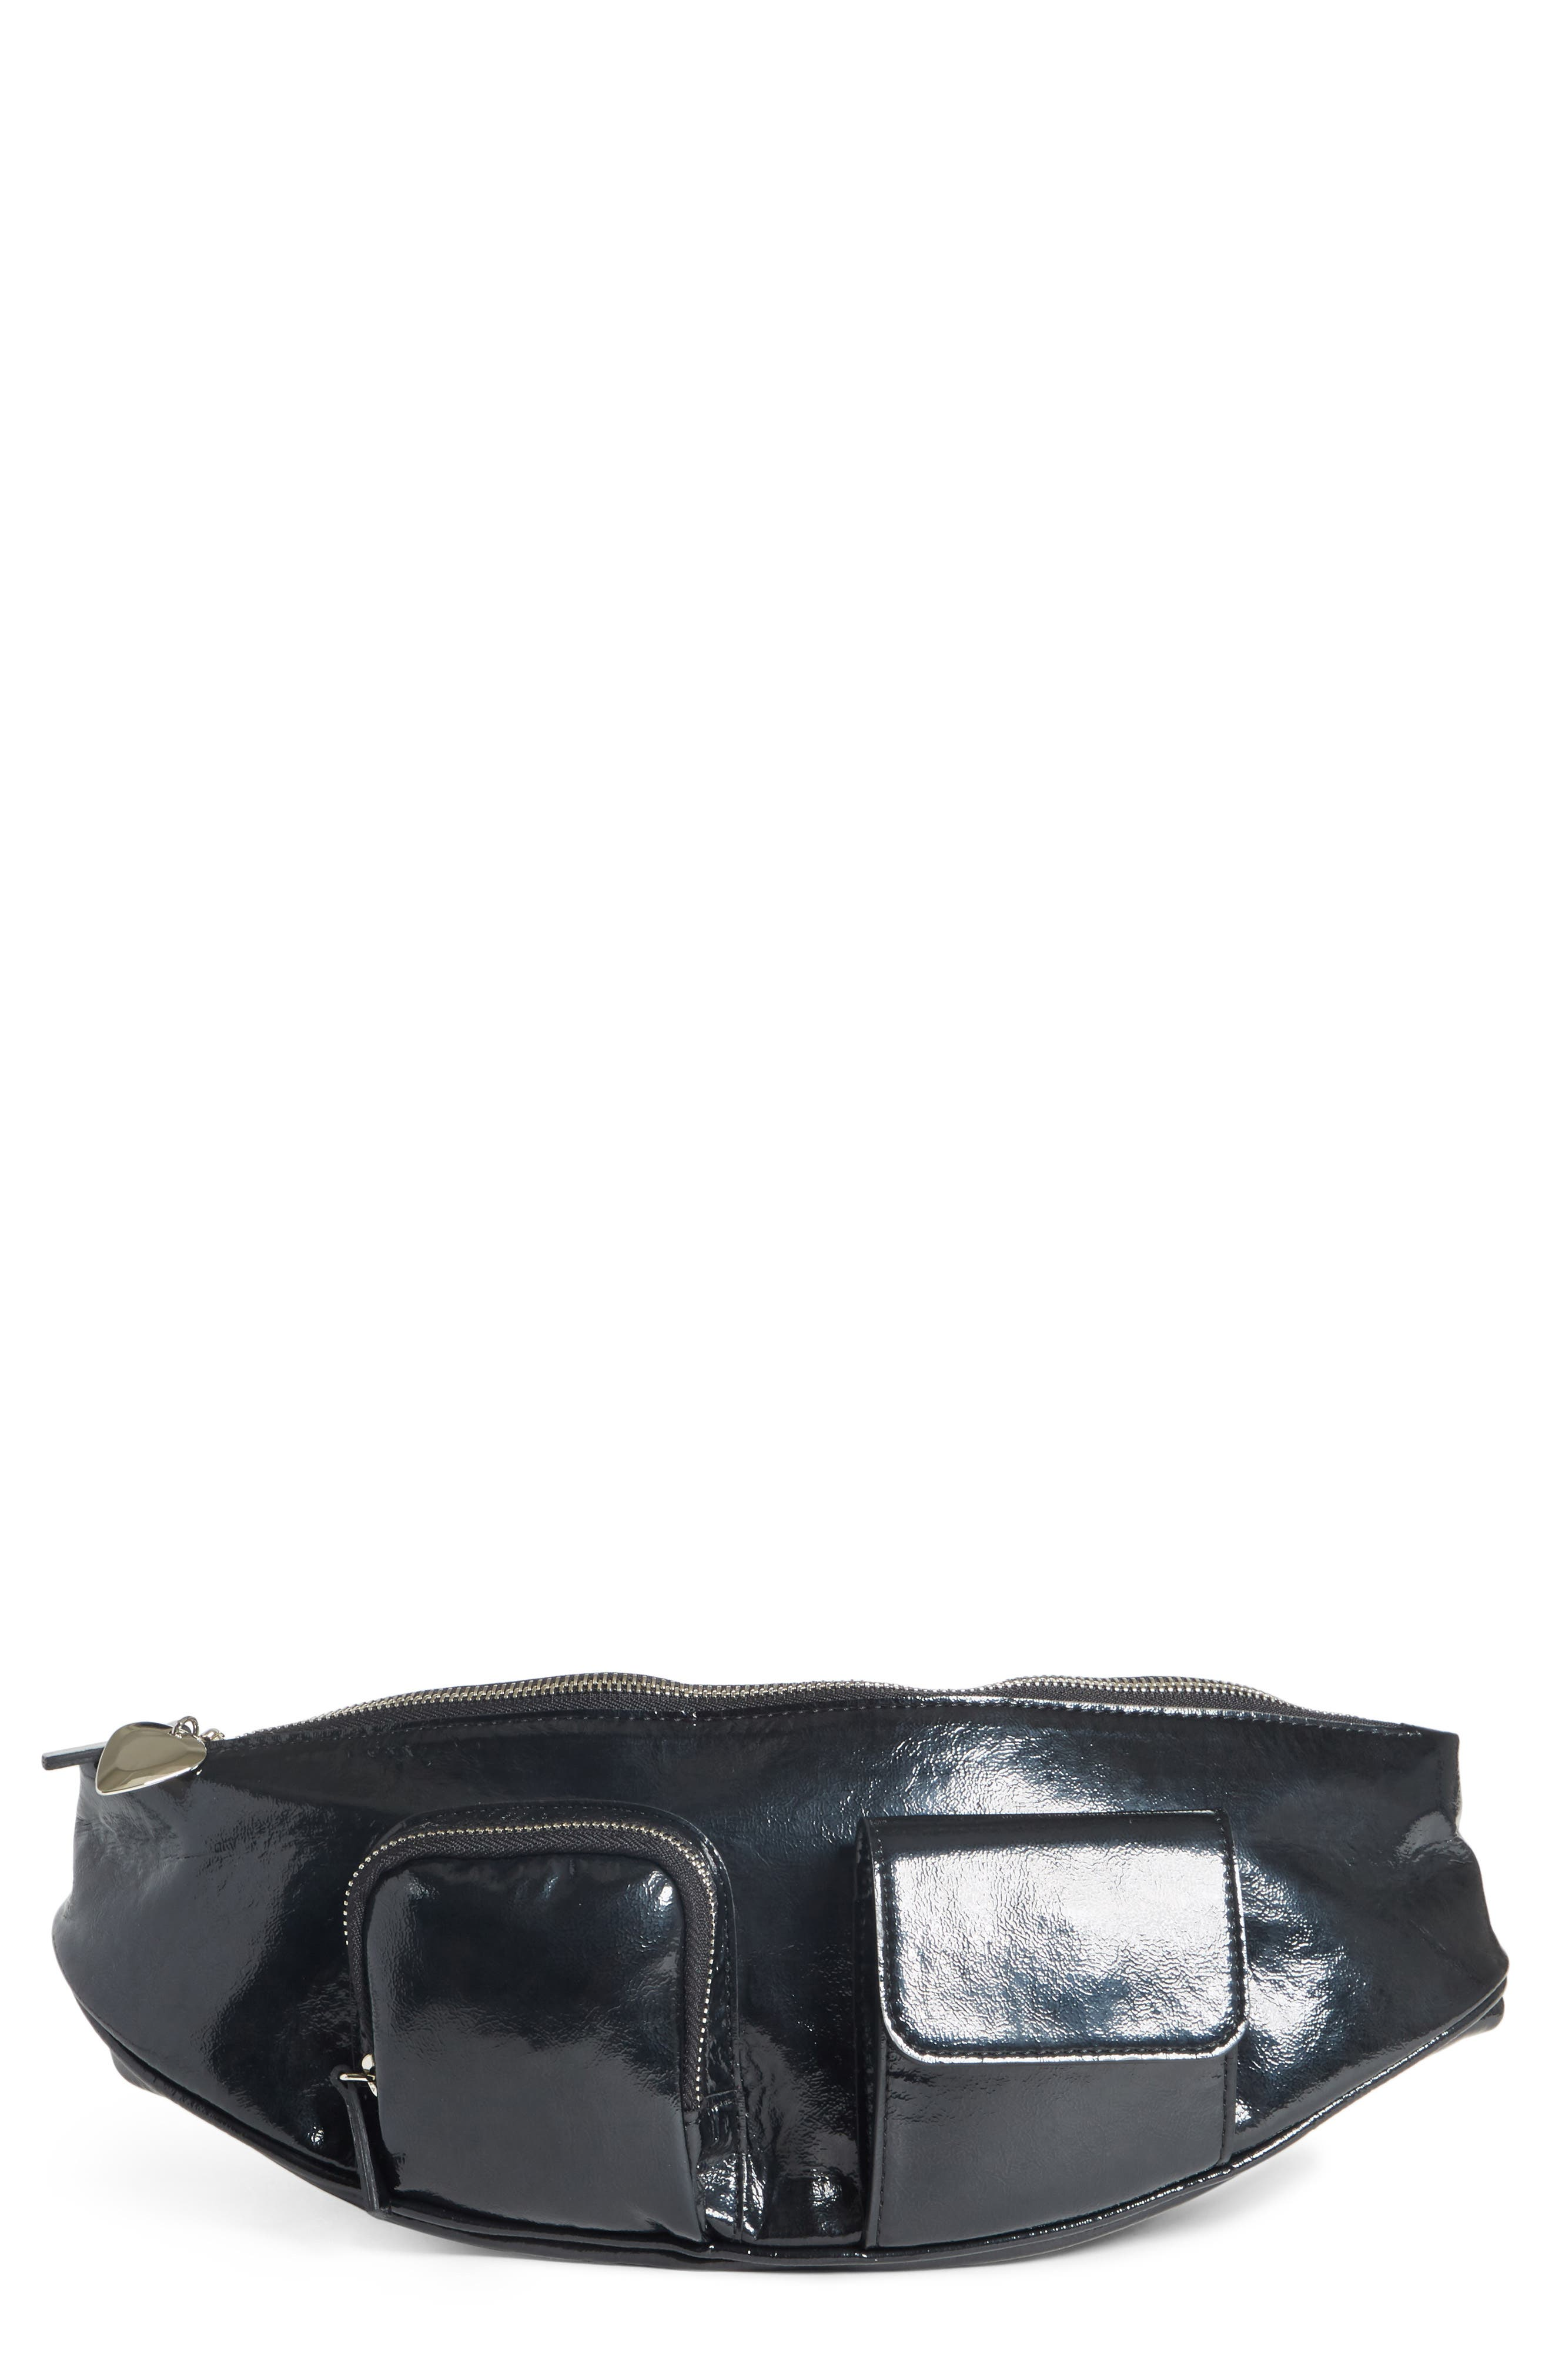 Major Convertible Belt Bag,                             Main thumbnail 1, color,                             BLACK PATENT